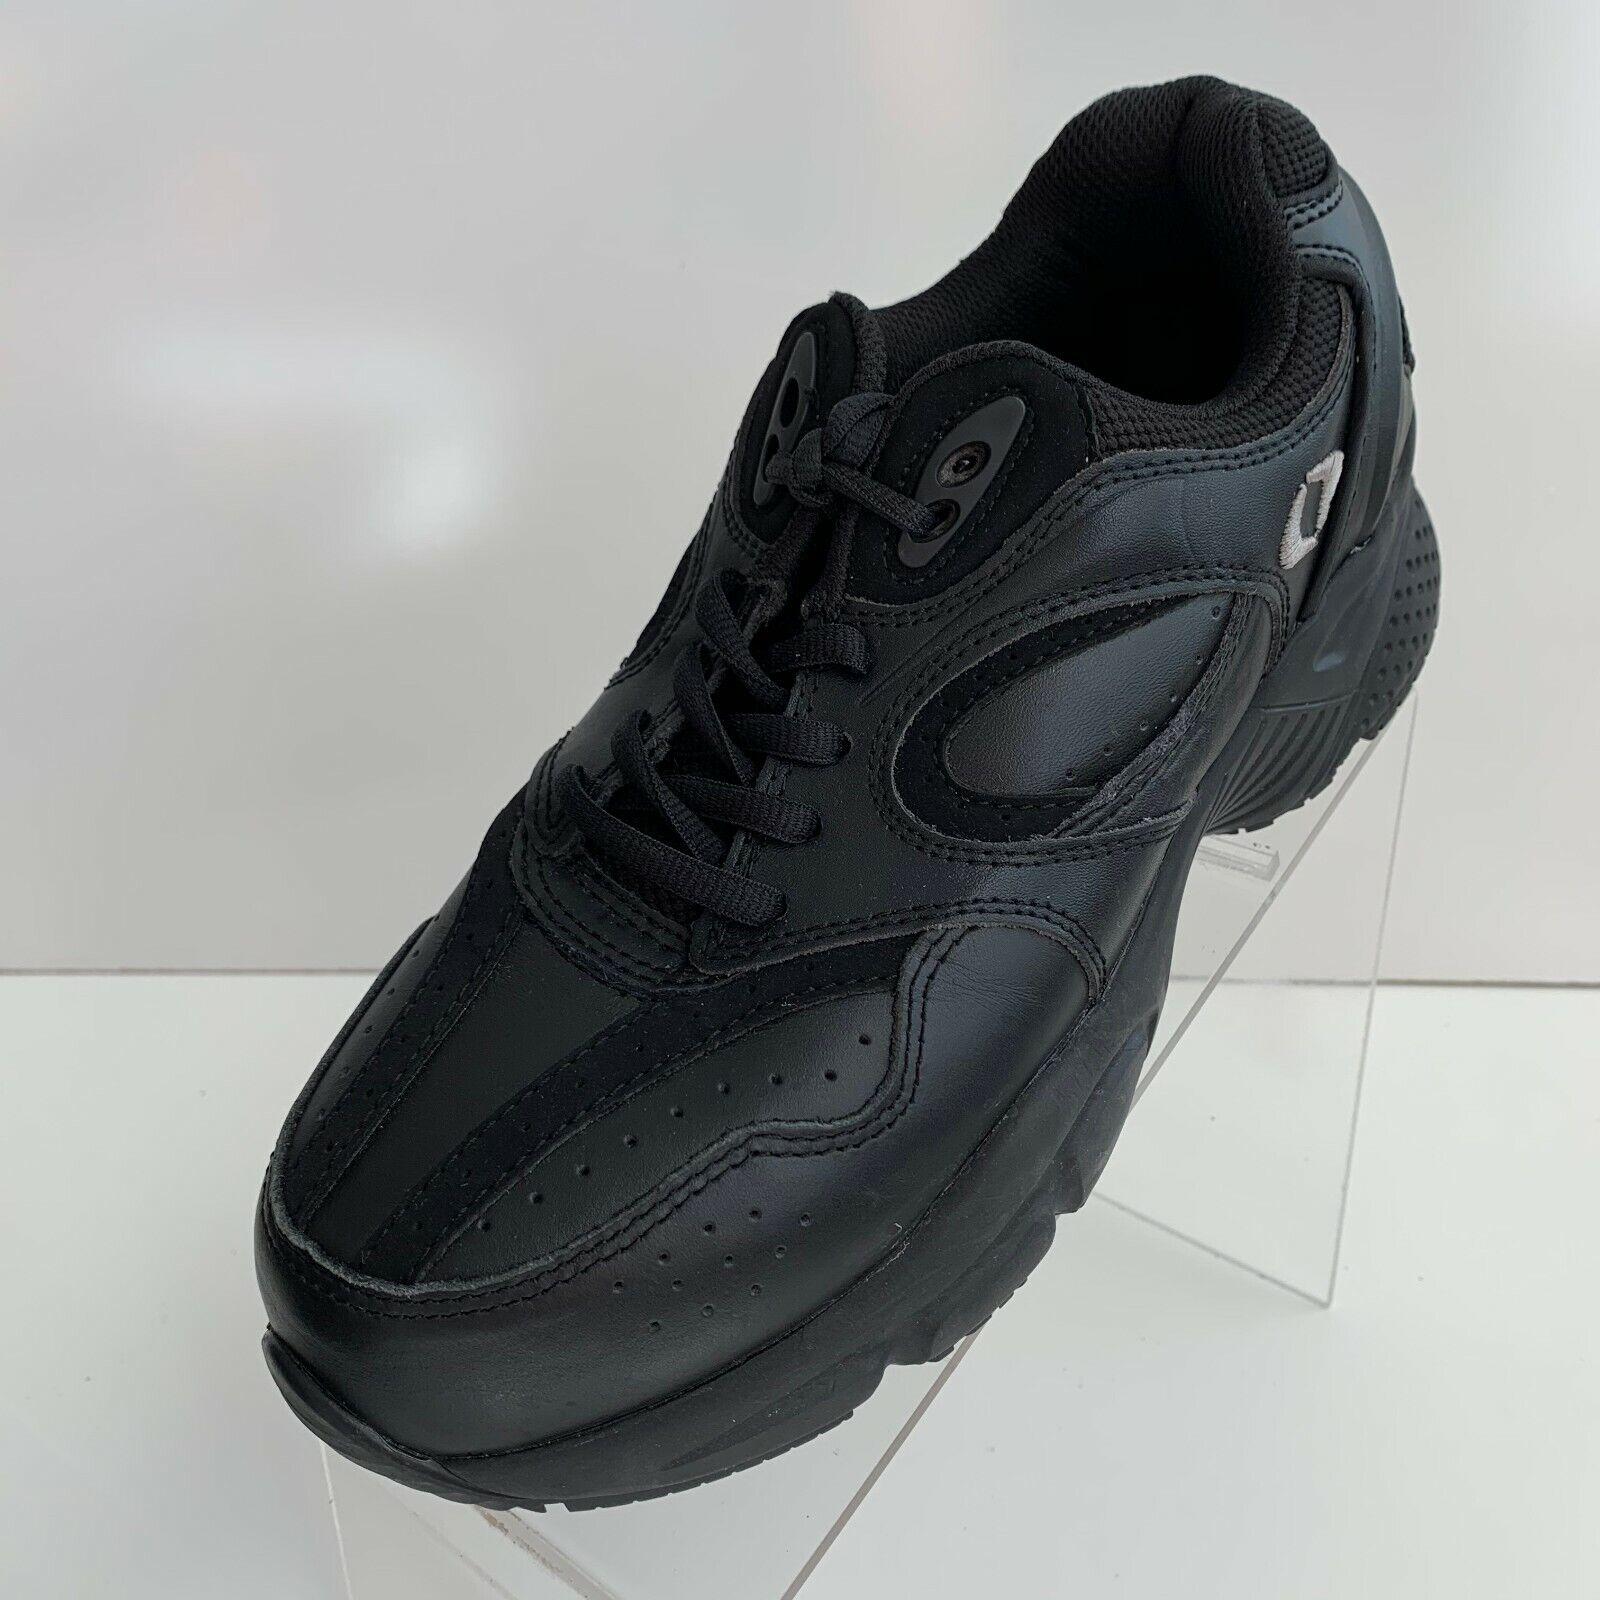 Apex Walker X801 Womens Walking Diabetic Black Leather Lace Up Shoes Size 8W